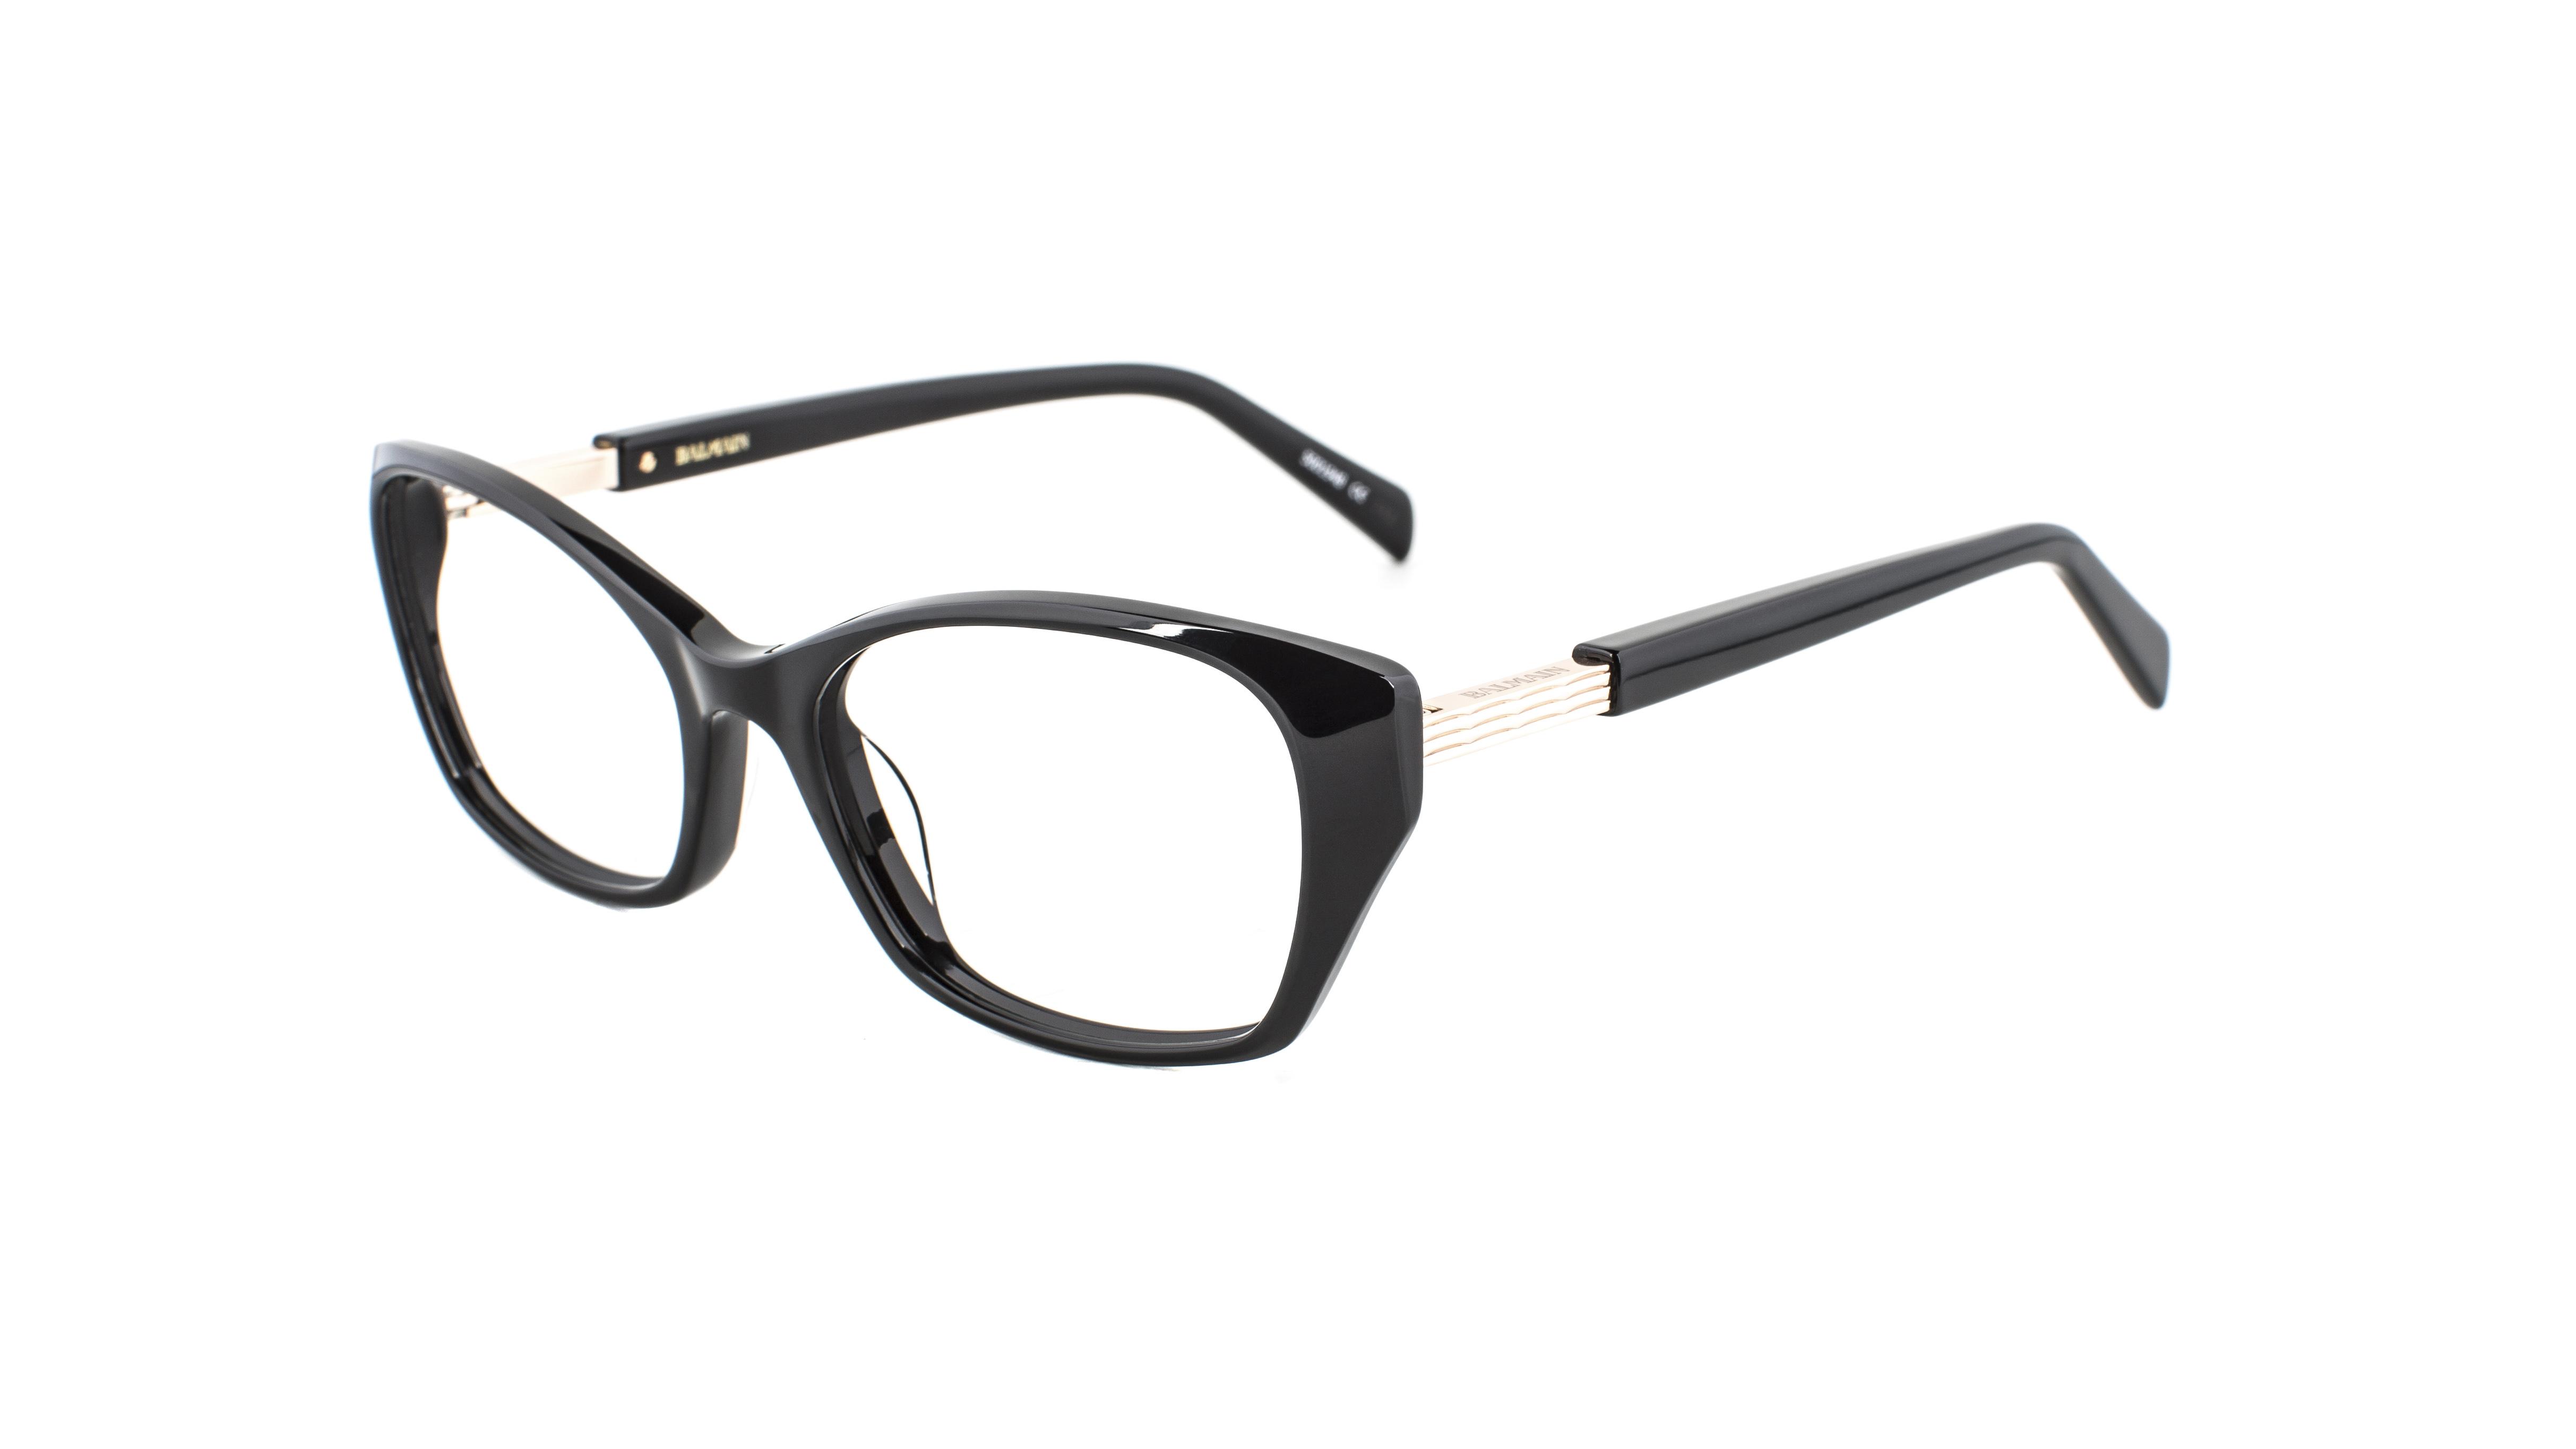 Balmain x Specsavers BL1518S 30570740 - RRP 2 pairs single vision $459